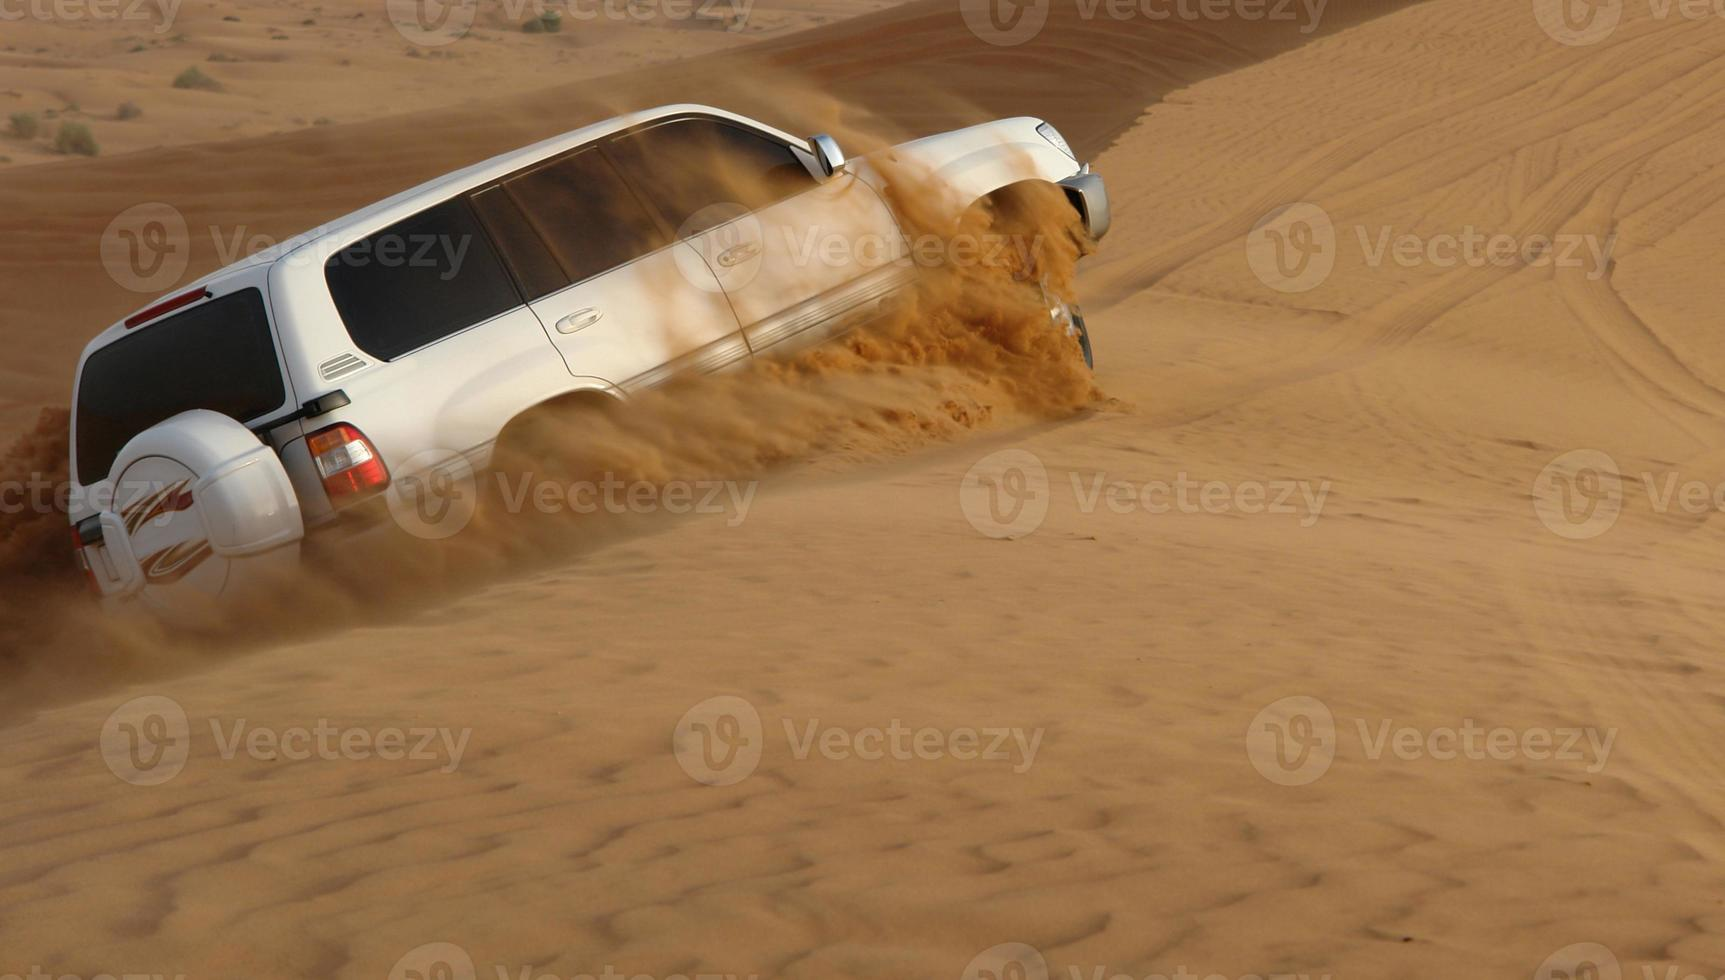 aventura de safári no deserto foto